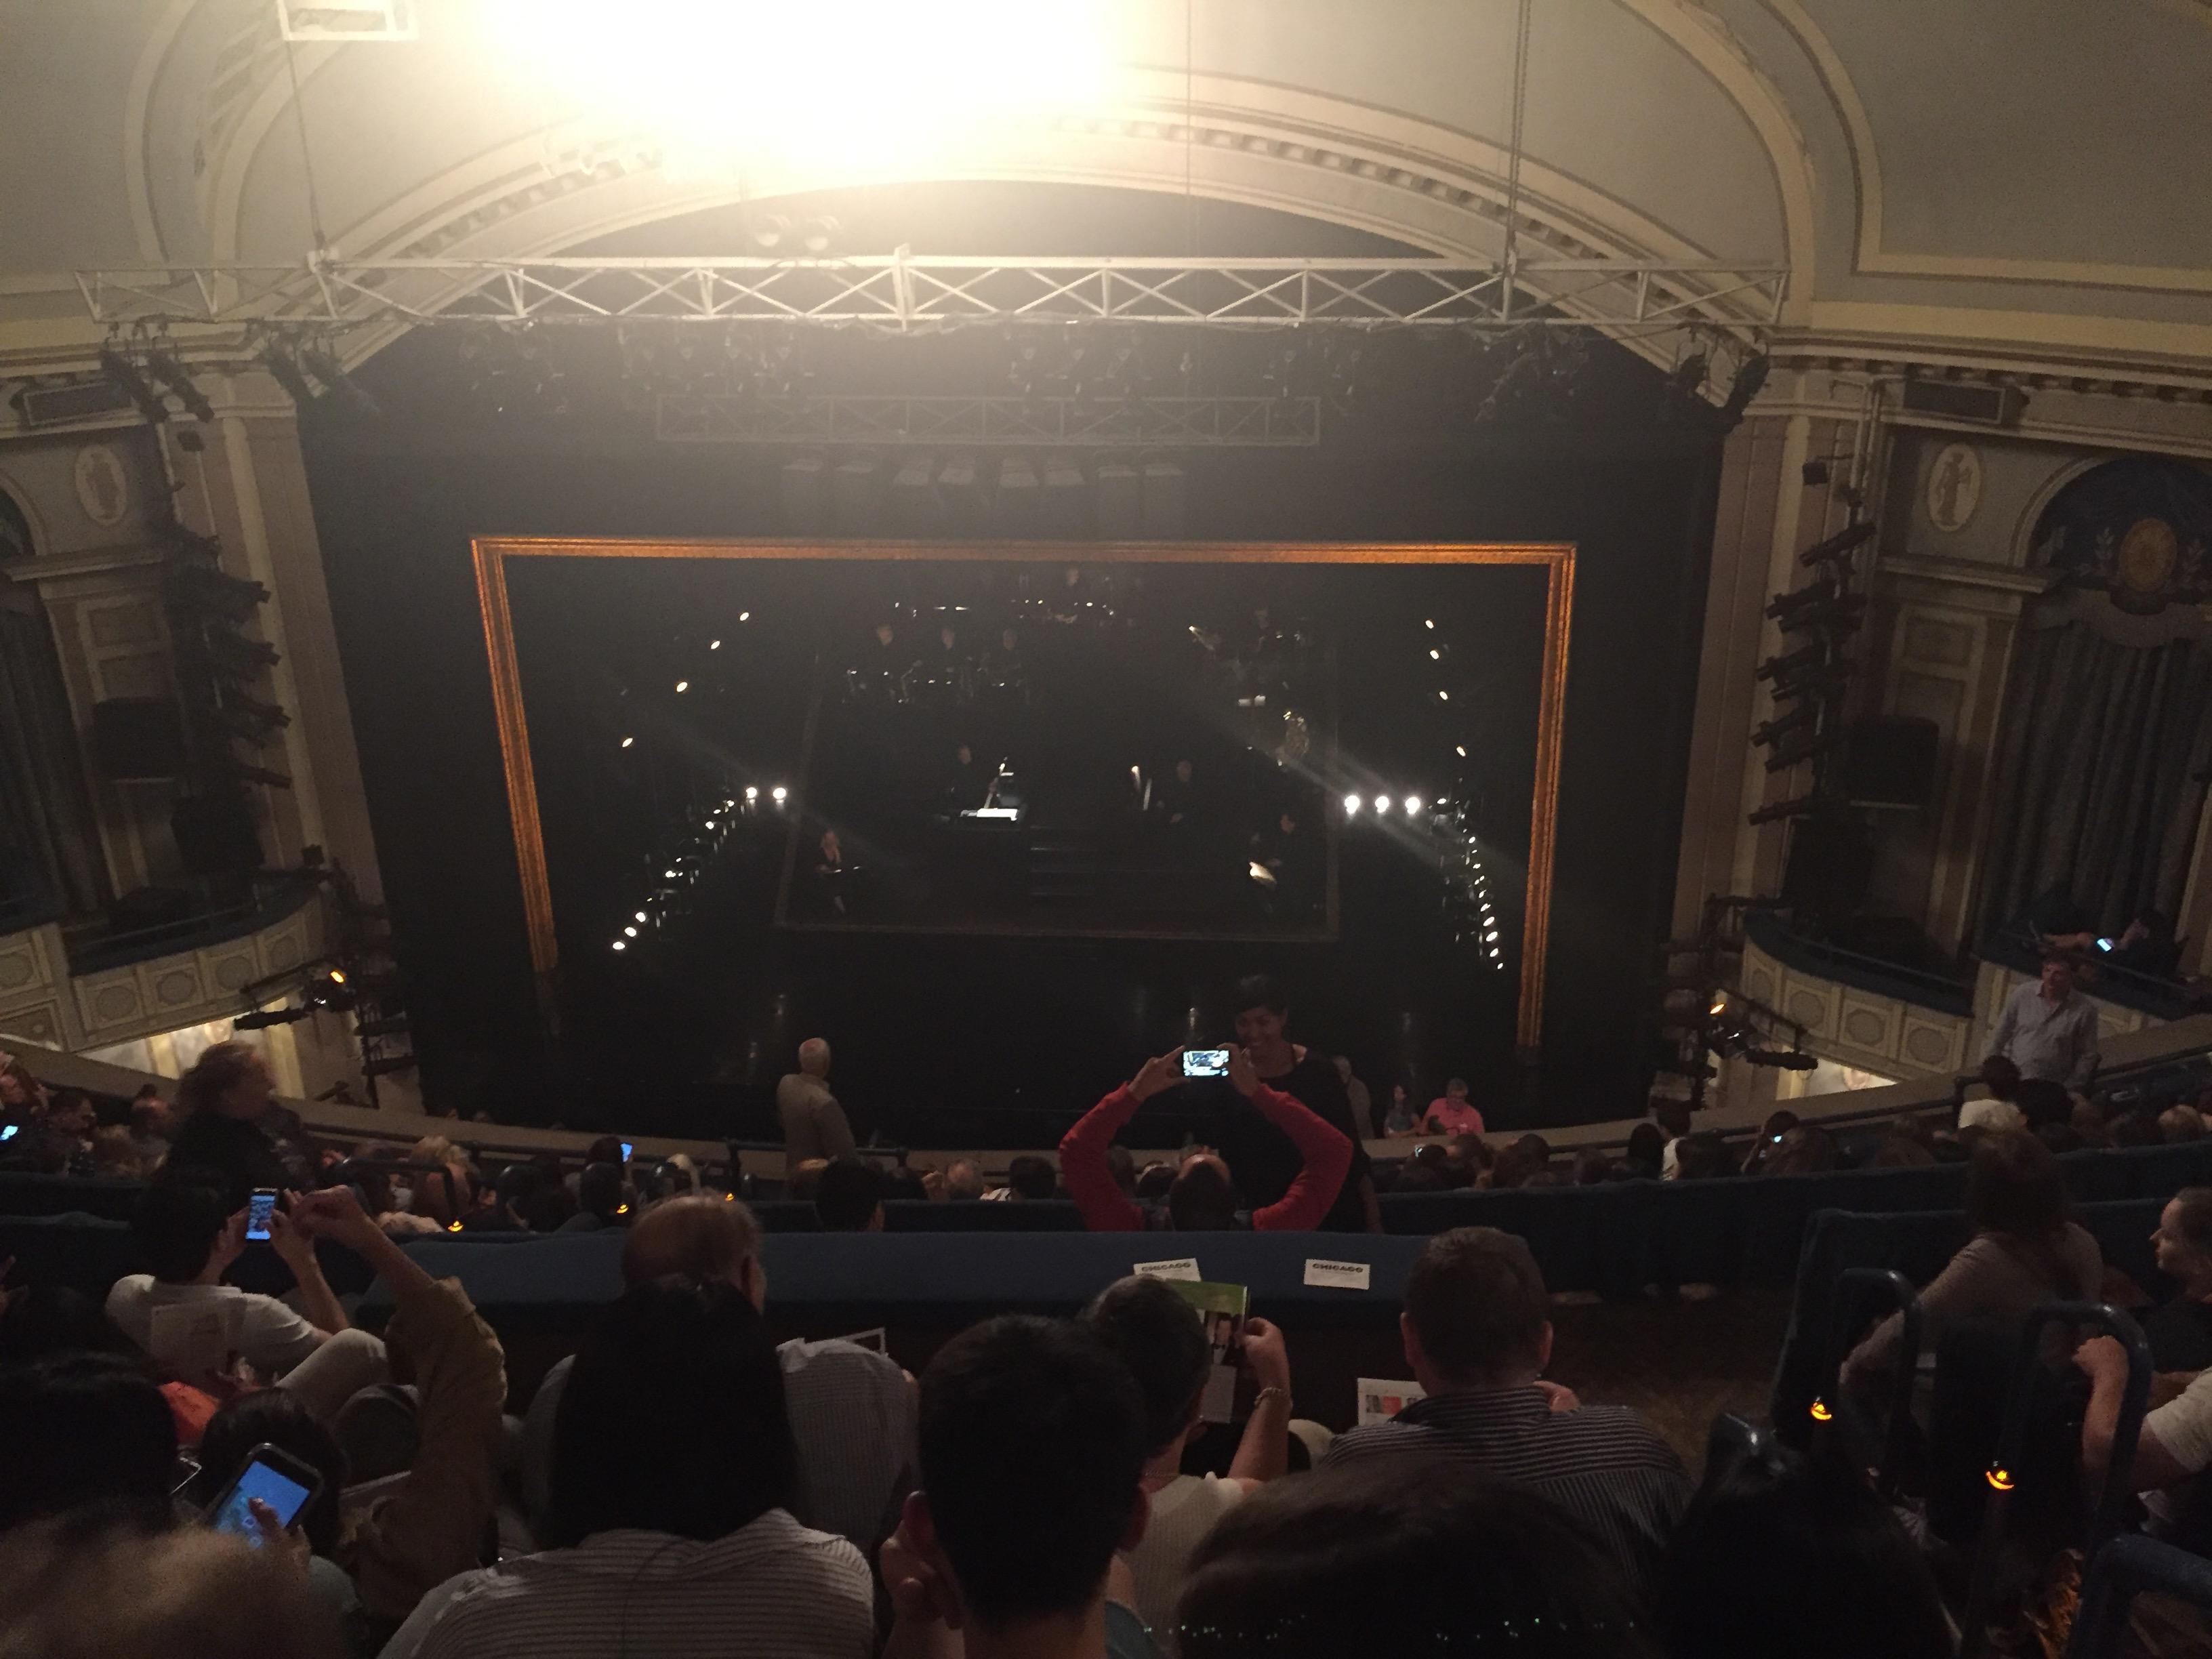 Ambassador Theatre Section Rear Mezz Row F Seat 122